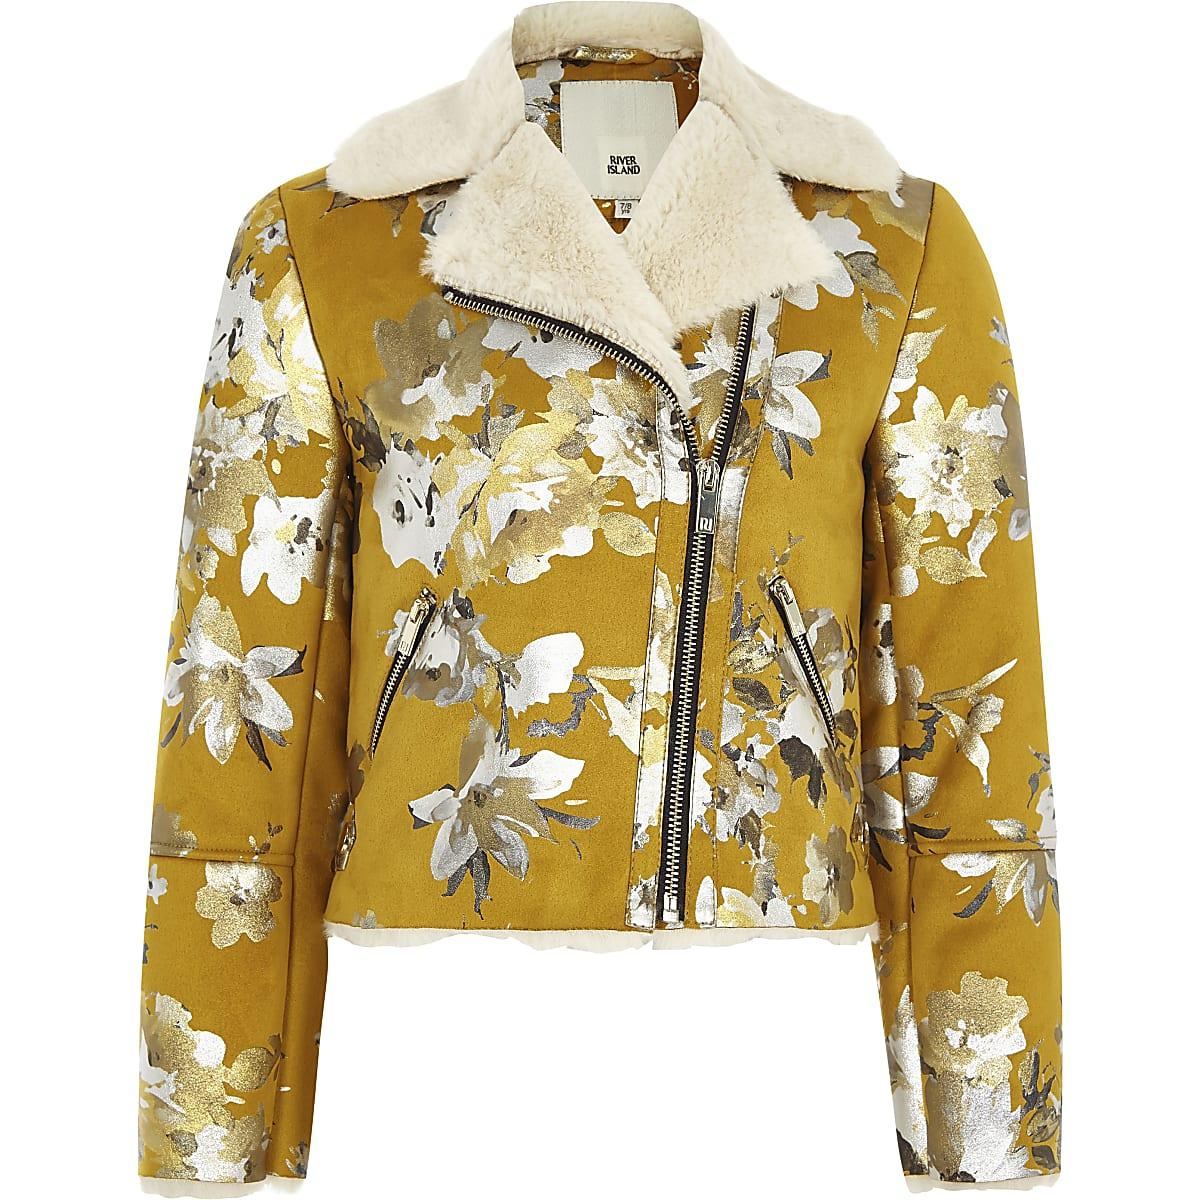 Girls yellow floral biker jacket